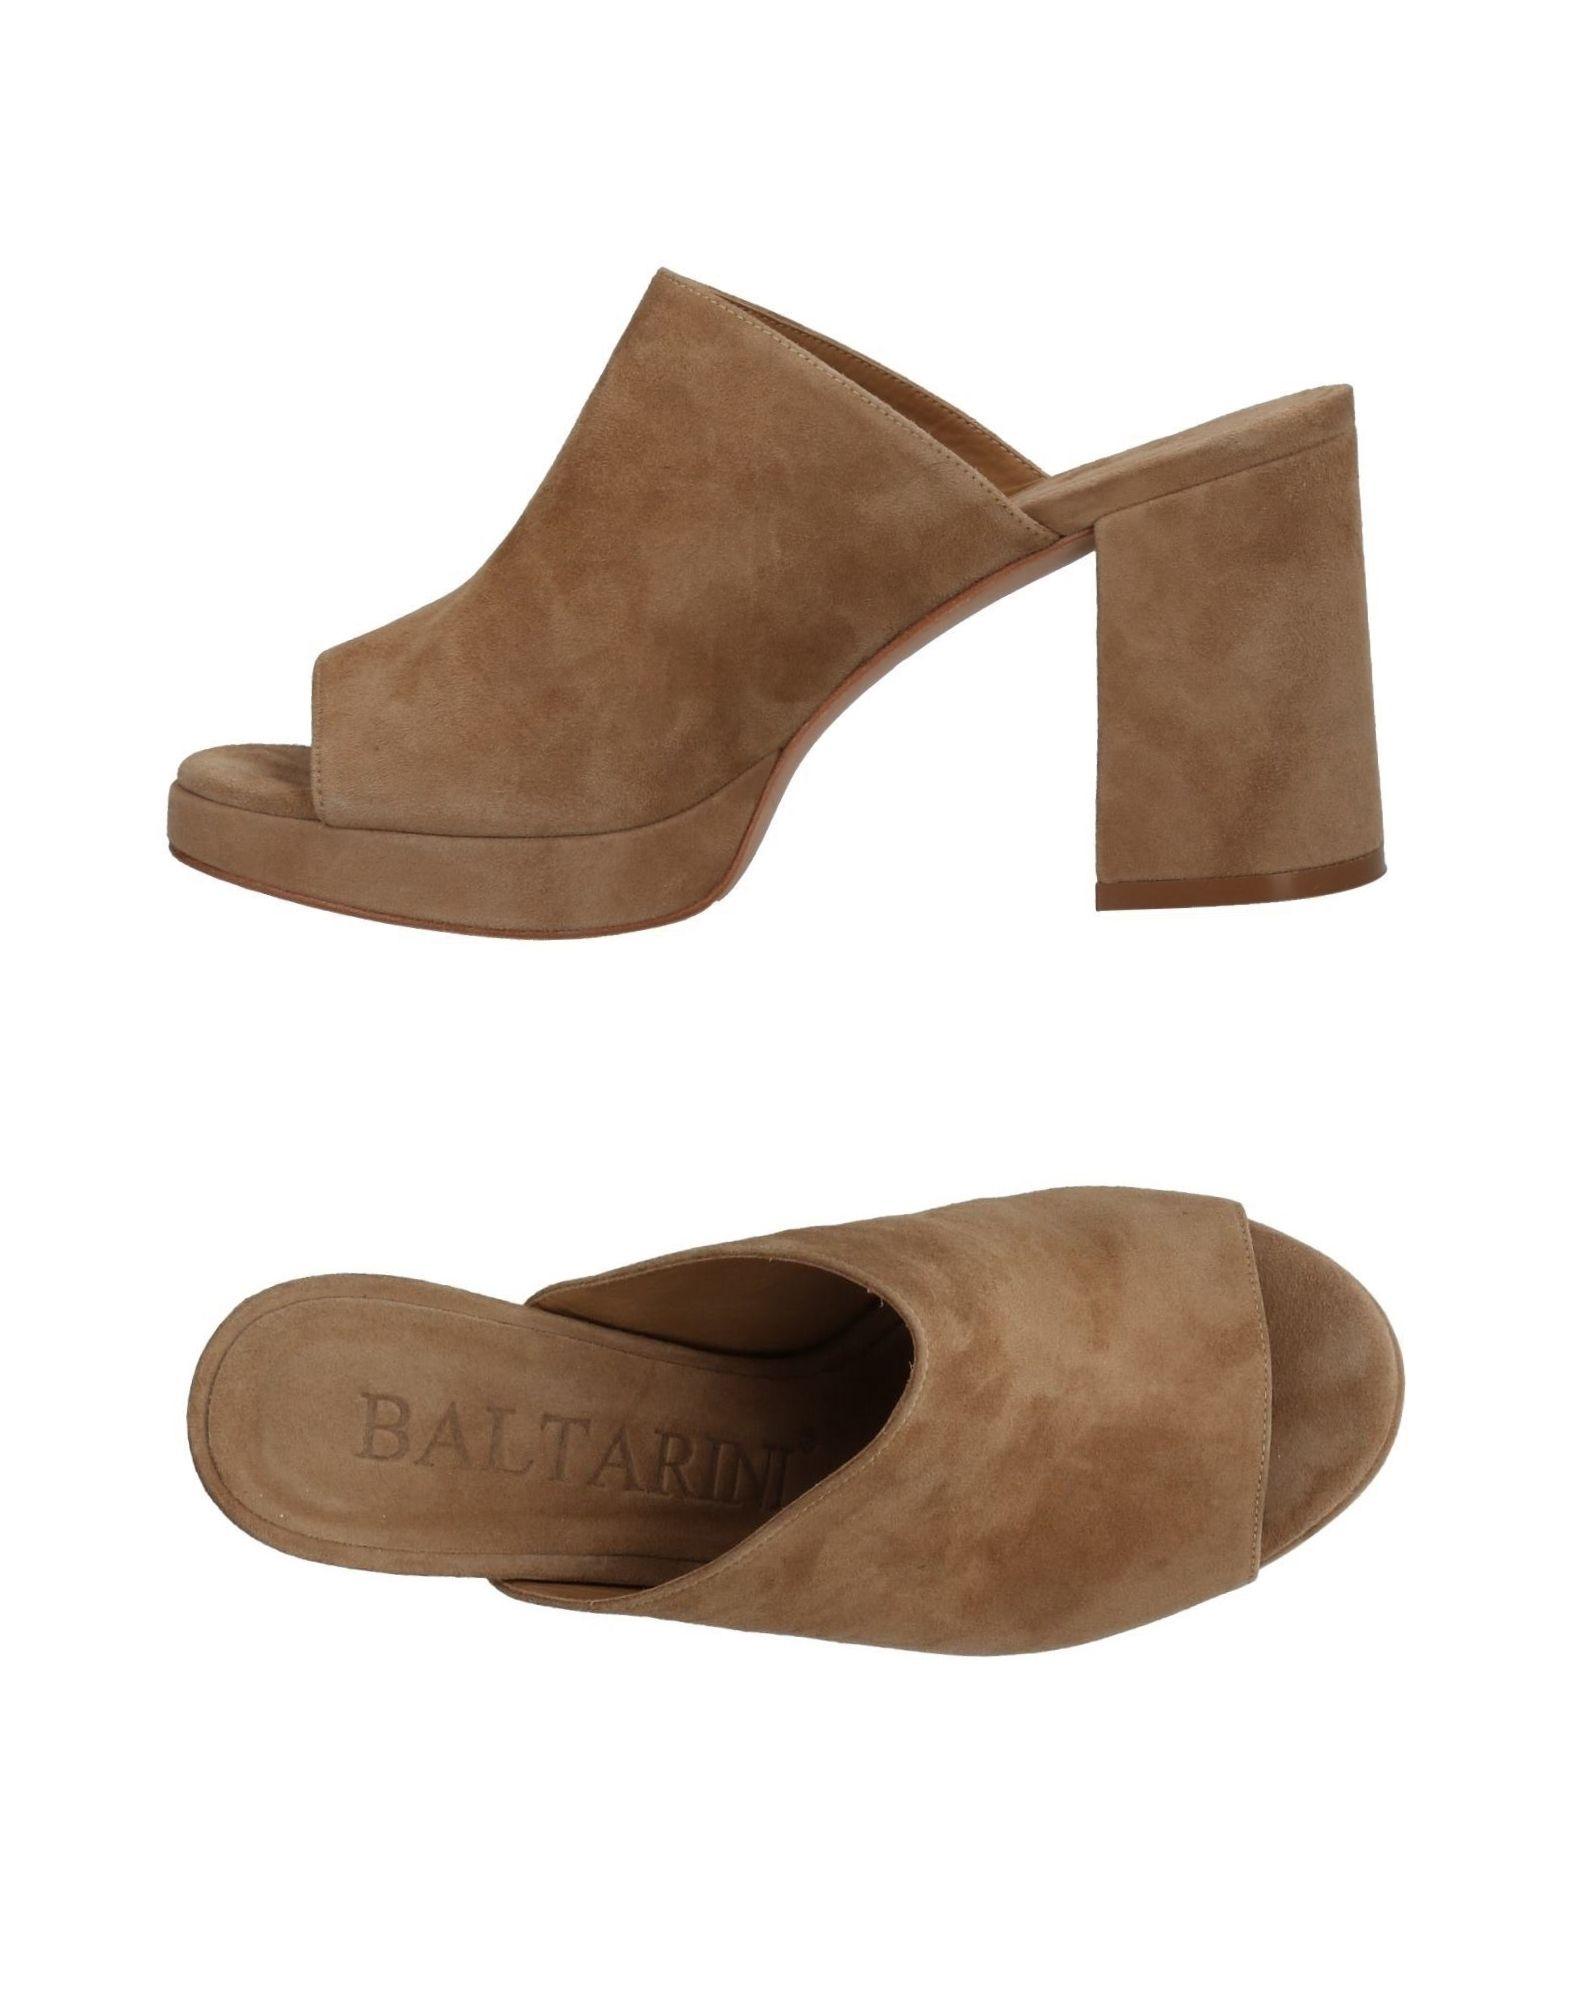 Baltarini Sandalen Damen  11458101VL Gute Qualität beliebte Schuhe